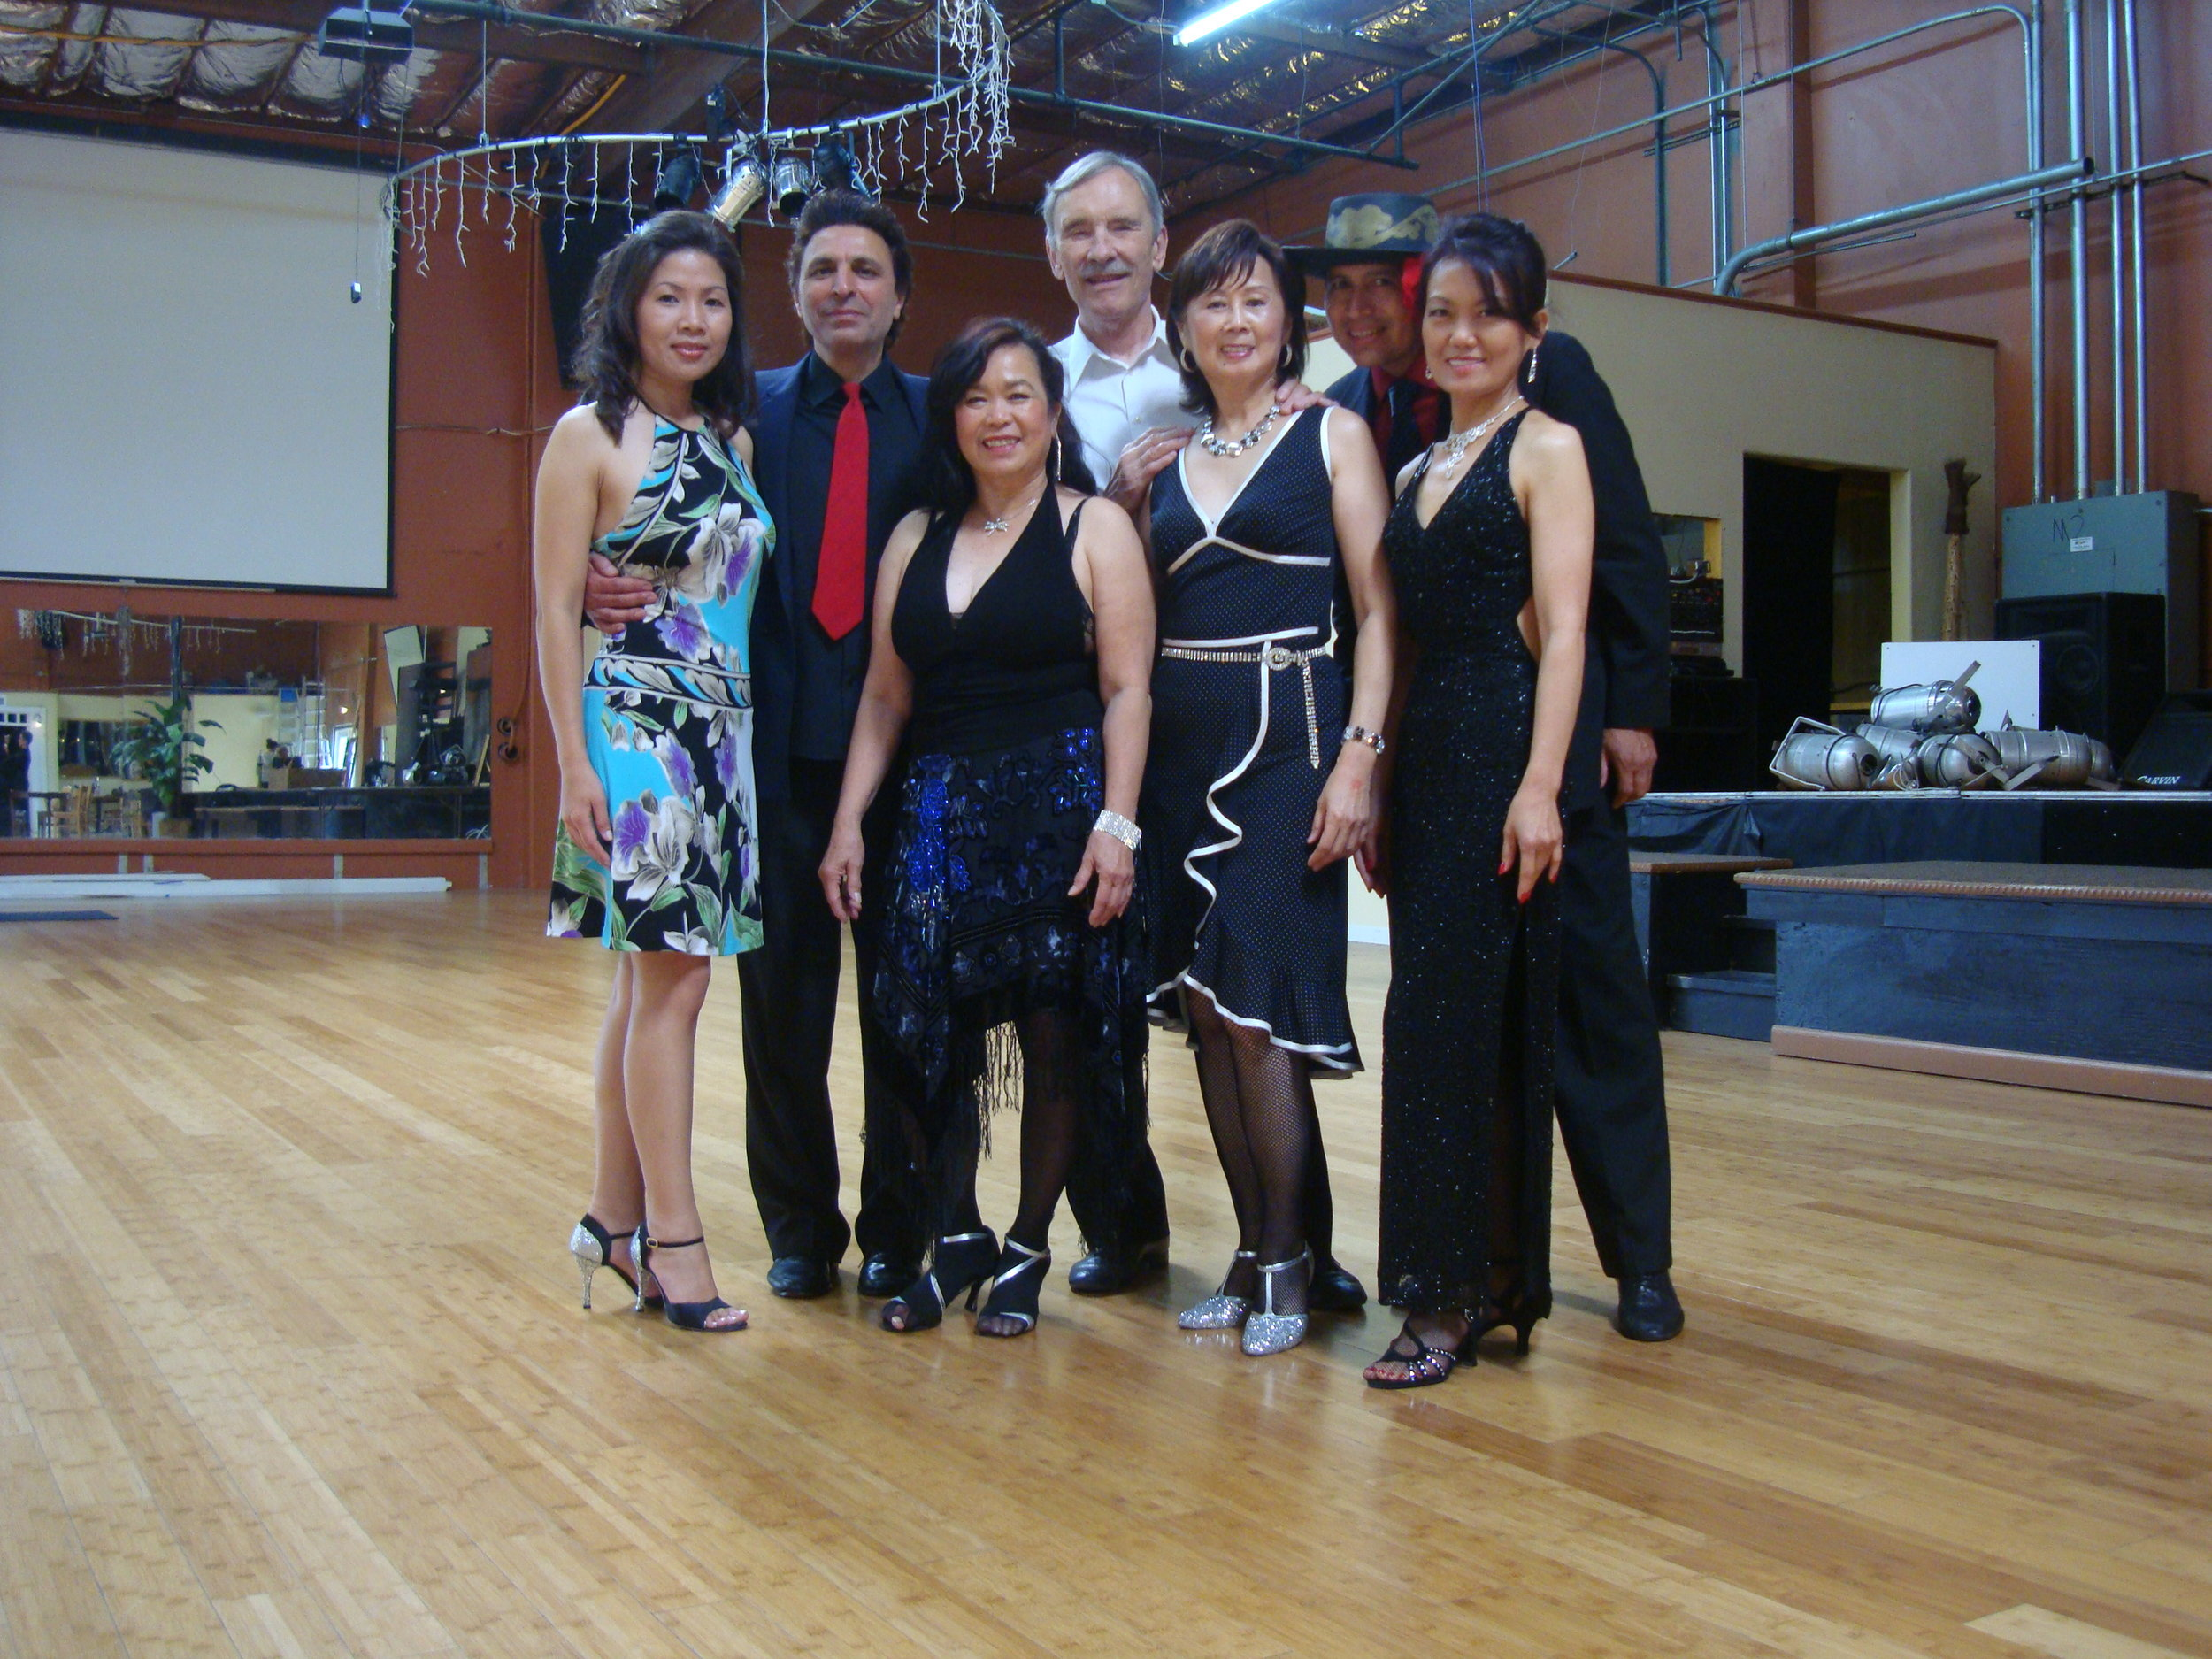 showcase group.JPG